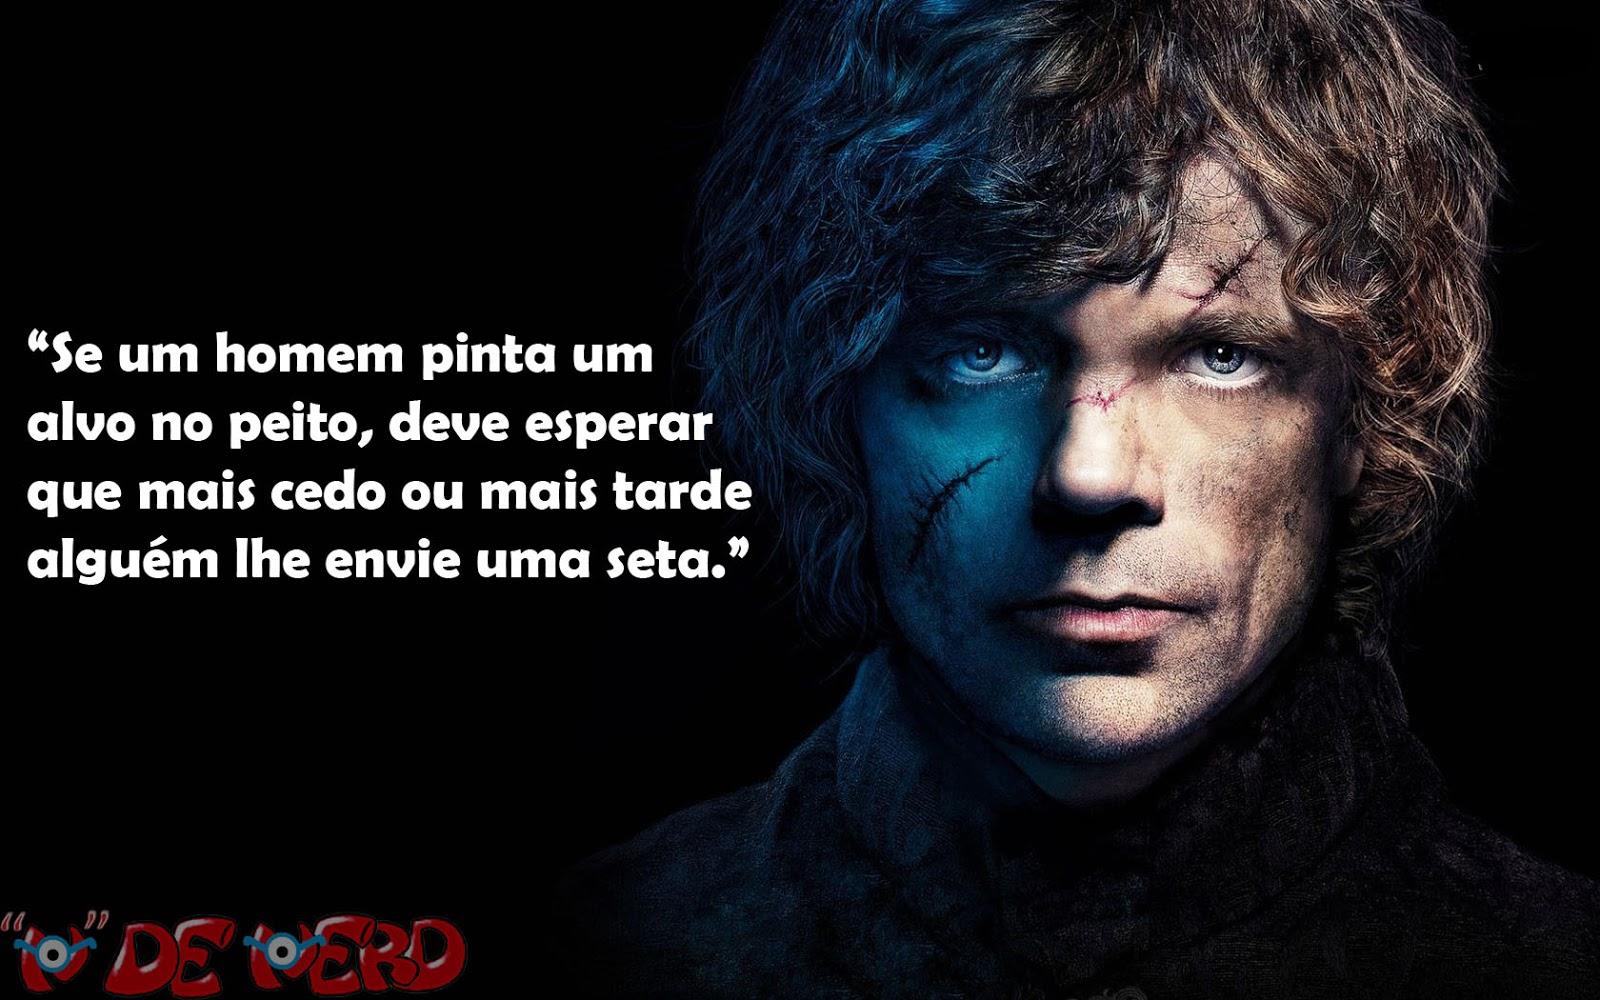 As Melhores Frases De Tyrion Lannister